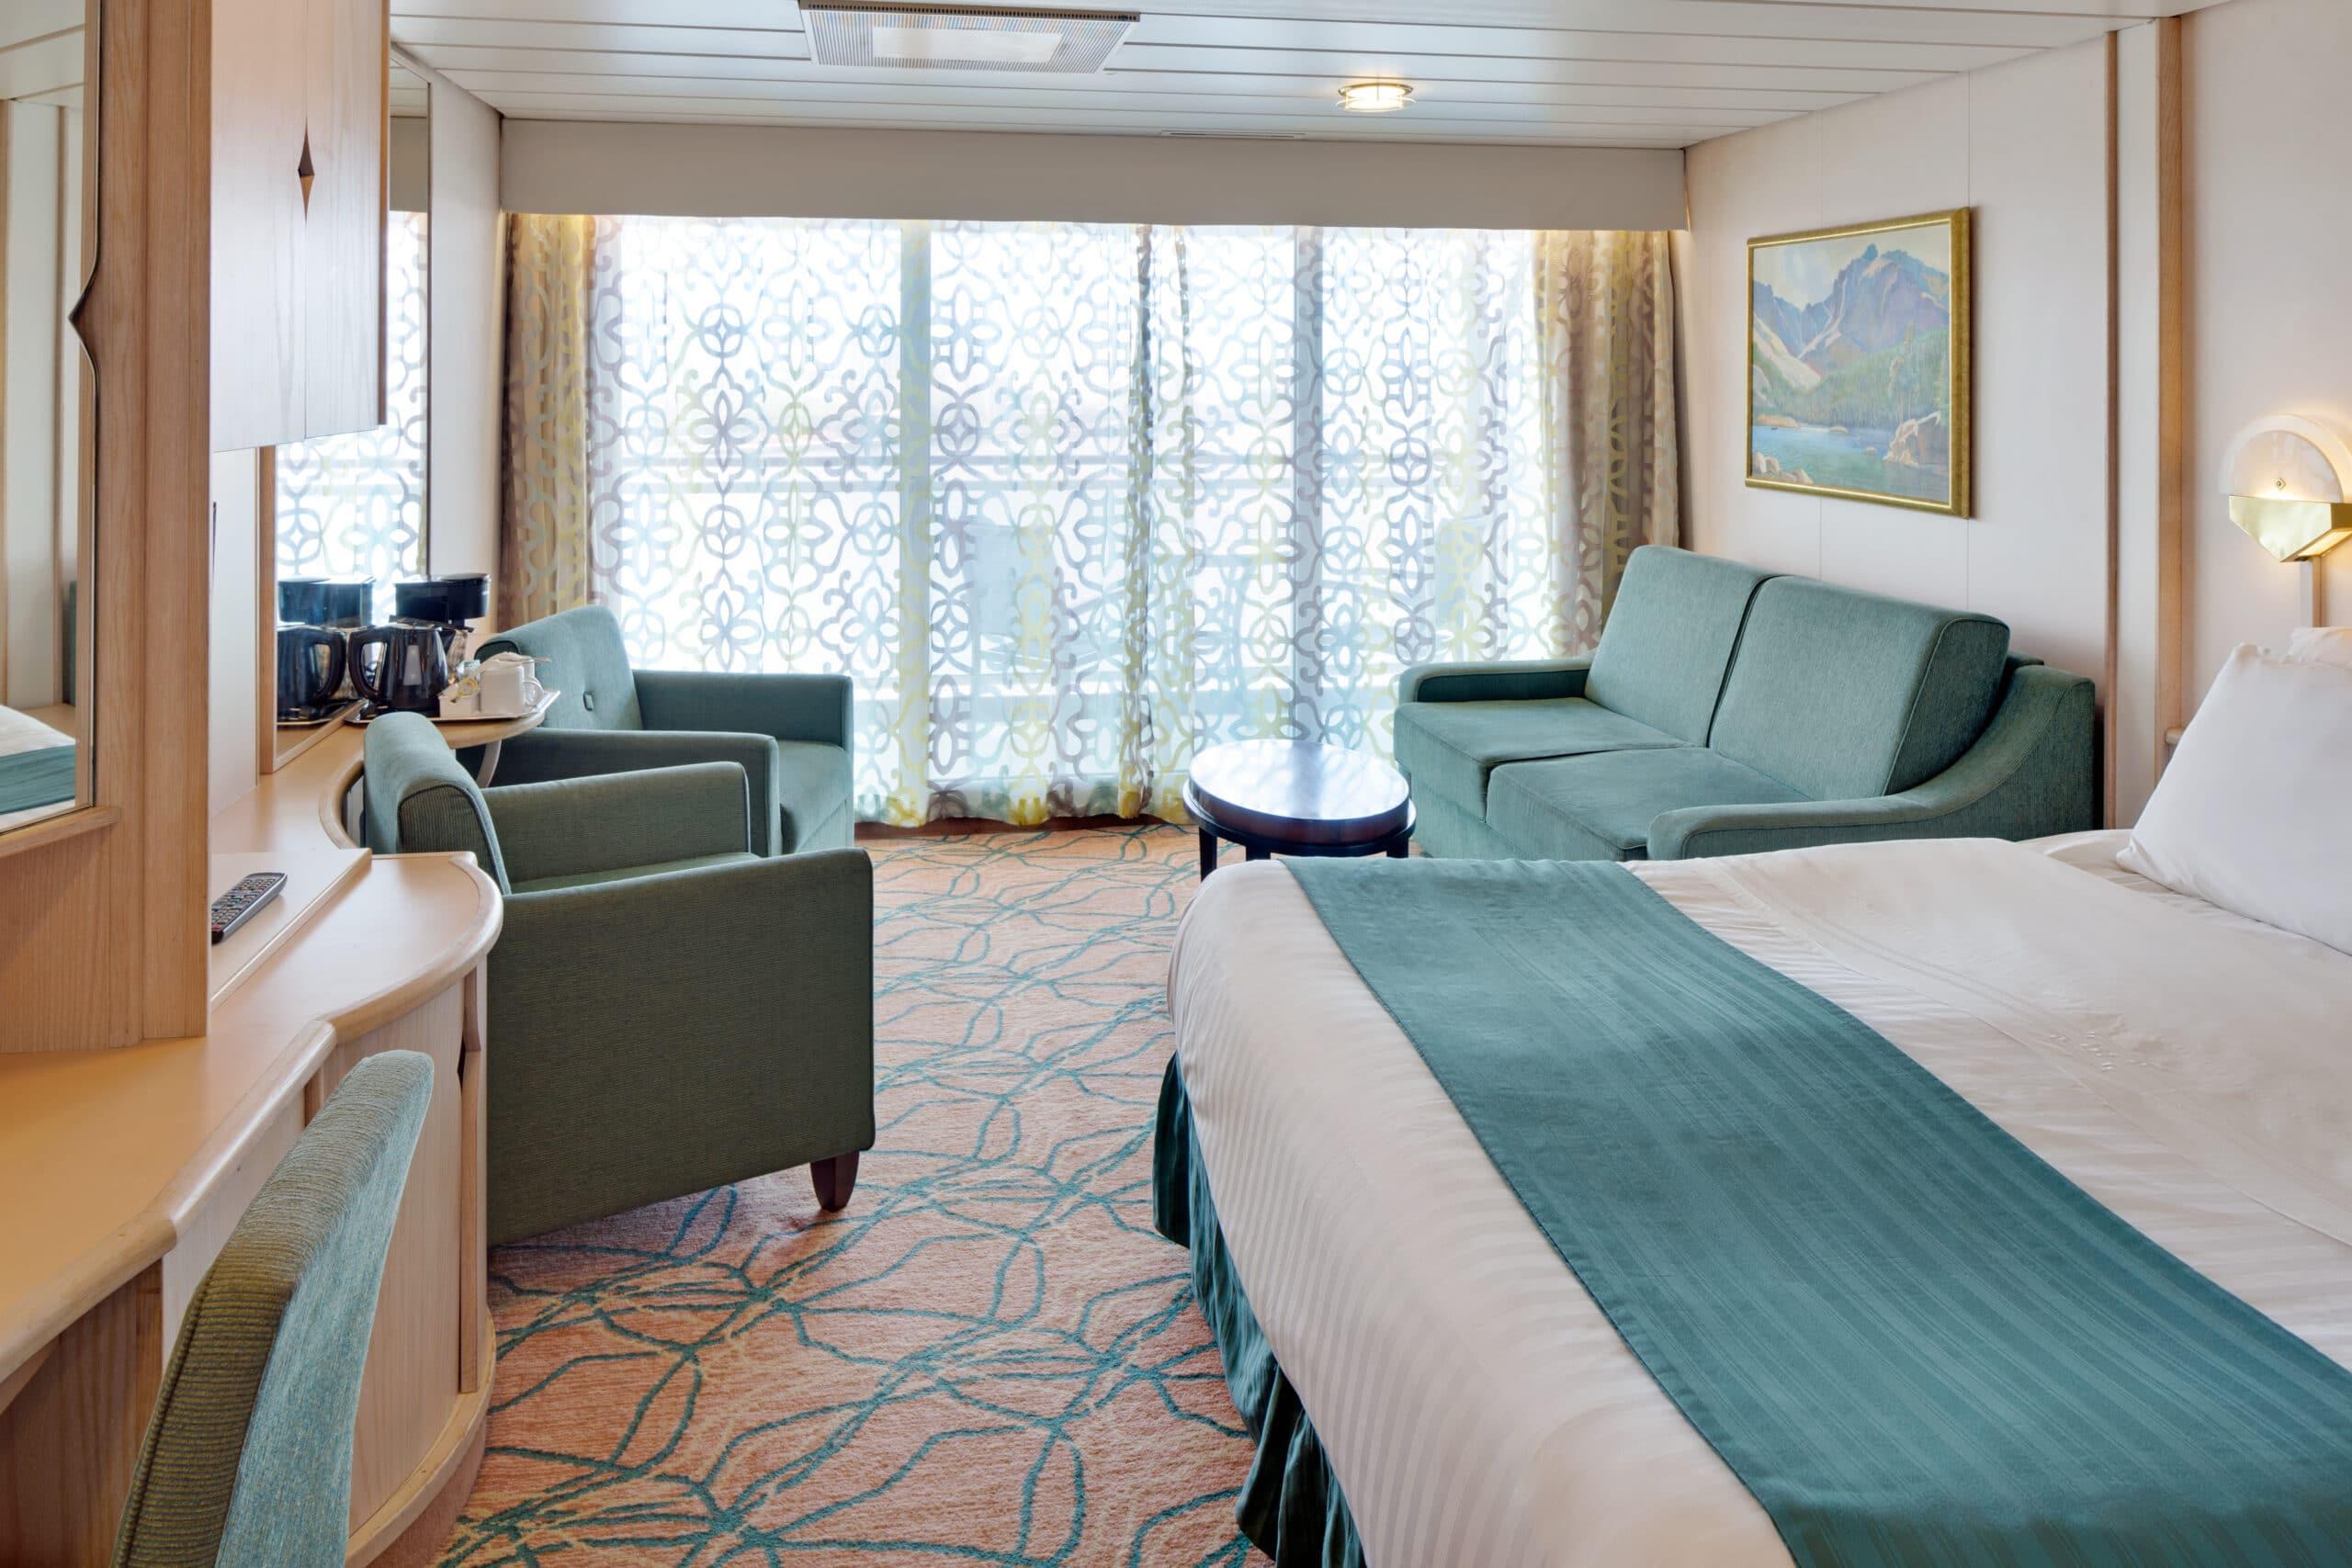 Royal-Caribbean-International-Vision-of-the-Seas-schip-cruiseschip-categorie-J3-J4-junior-suite